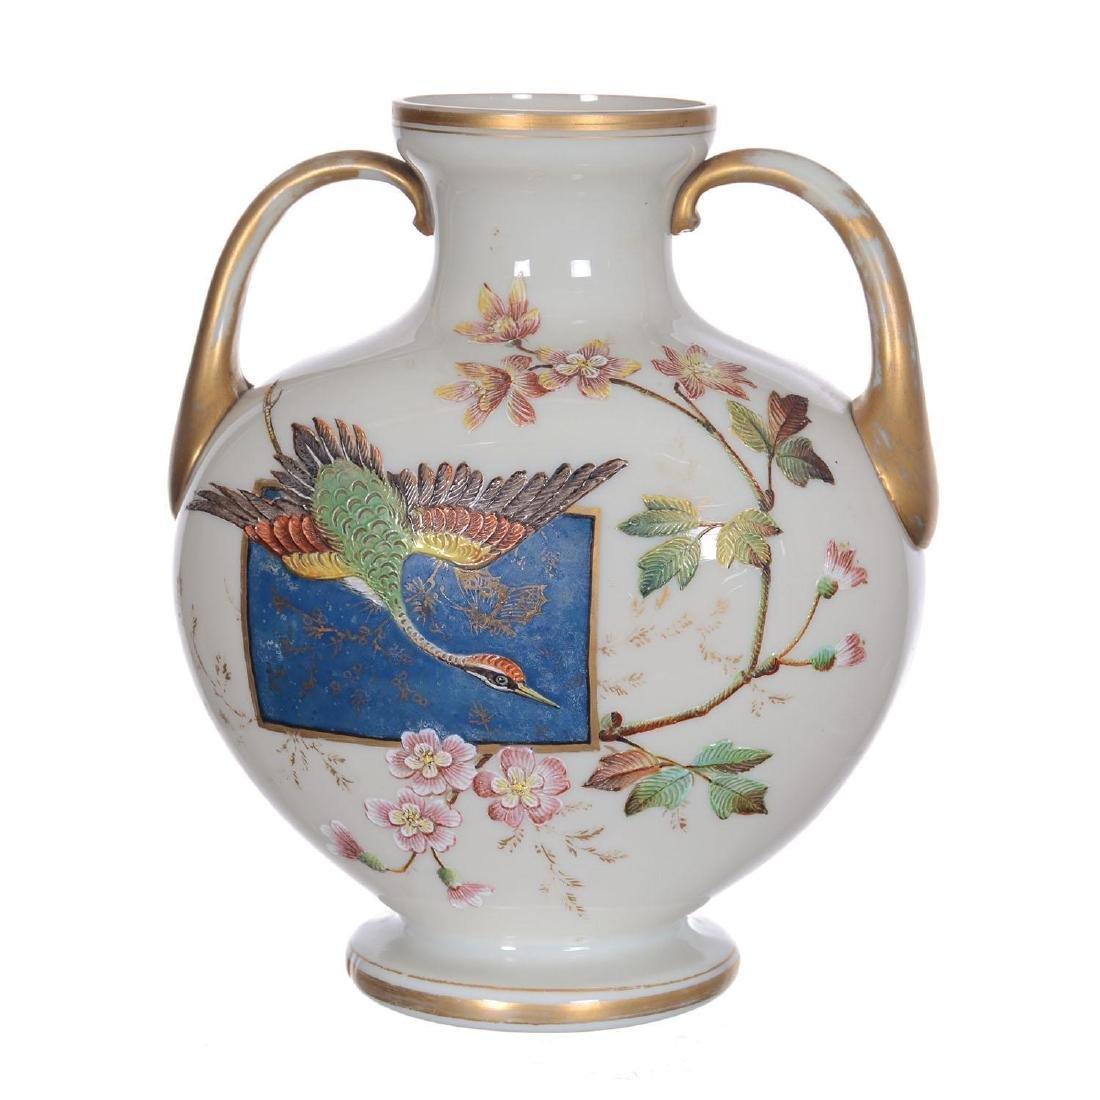 "8"" X 6.75"" Unmarked Webb Art Glass Two-Handled Vase"